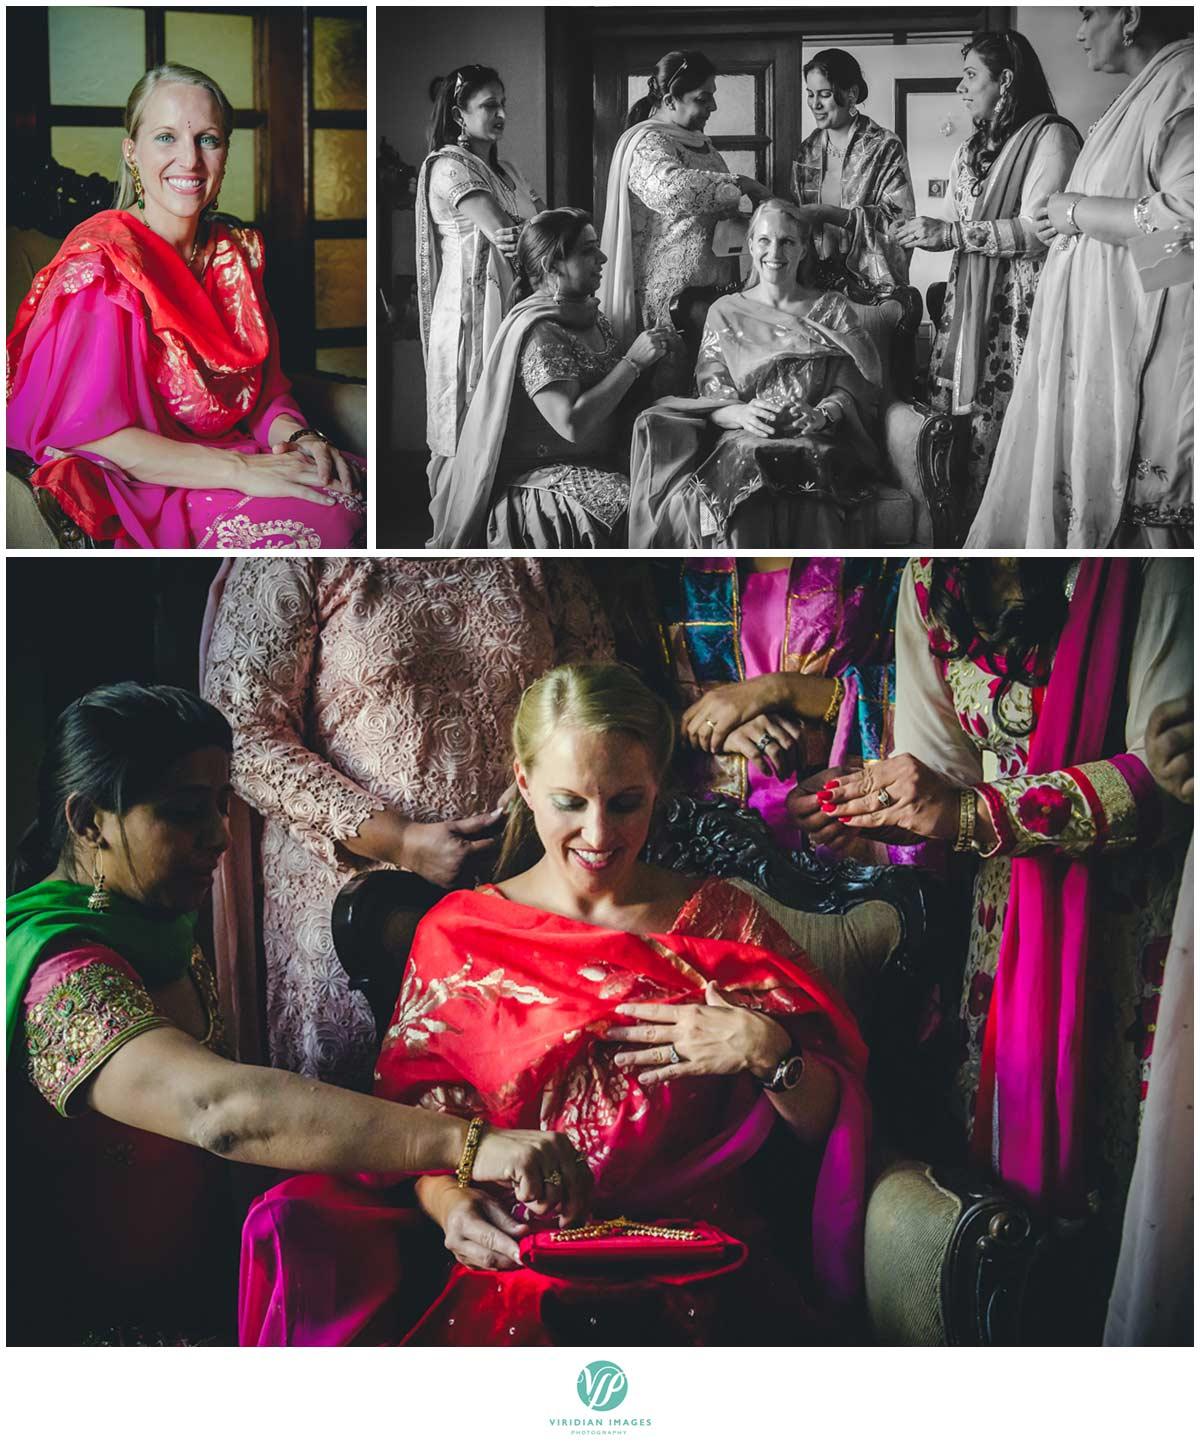 India_Wedding_Chandigarh_Cerenonies_Viridian_Images_Photography_photo_4.1